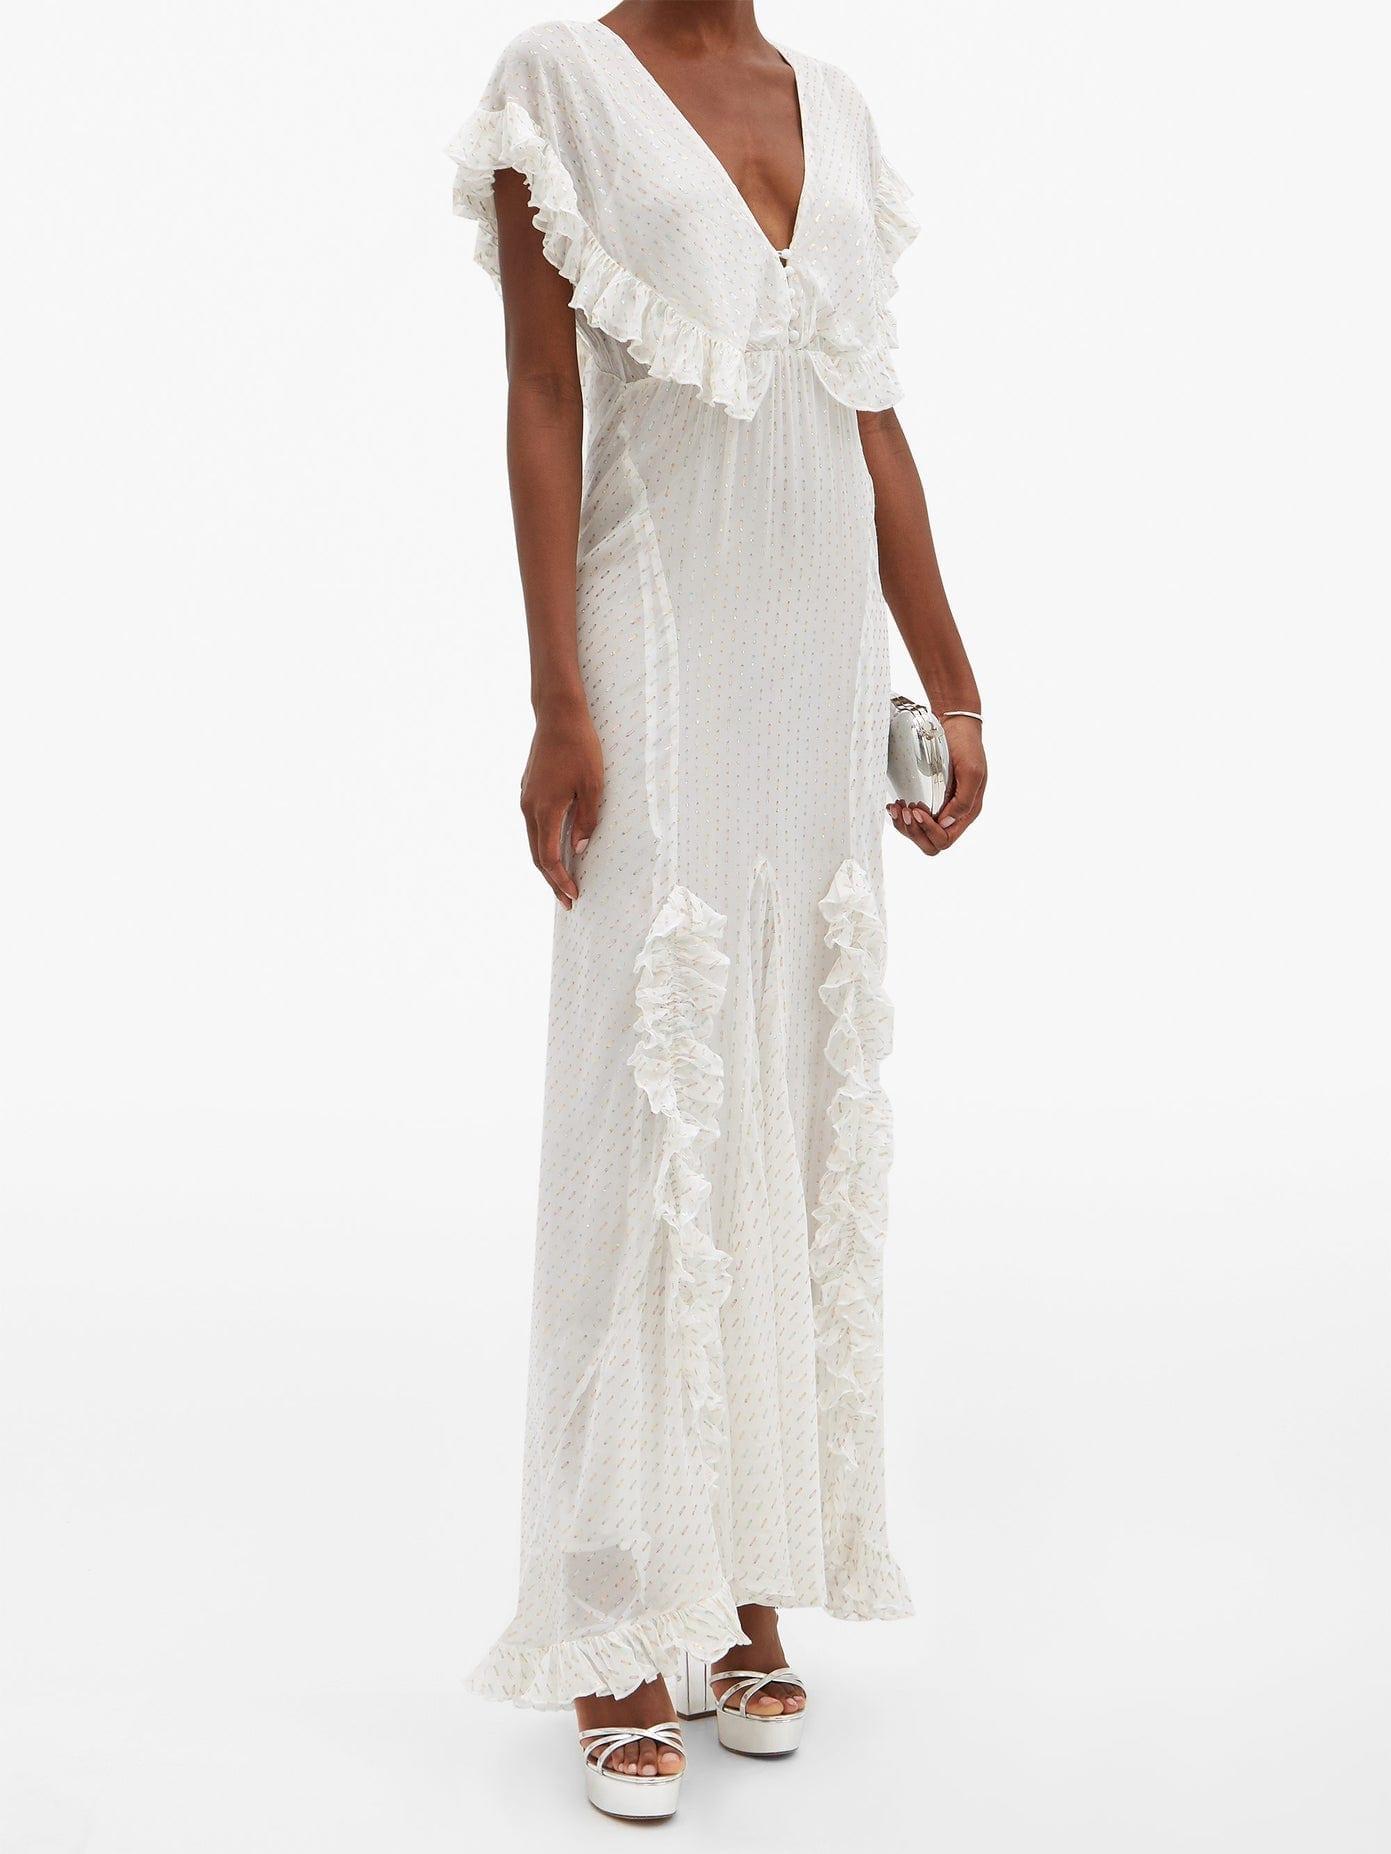 Rat Boa Ruffled Metallic Fil Coupe Maxi Dress We Select Dresses,Wedding Dresses For Men